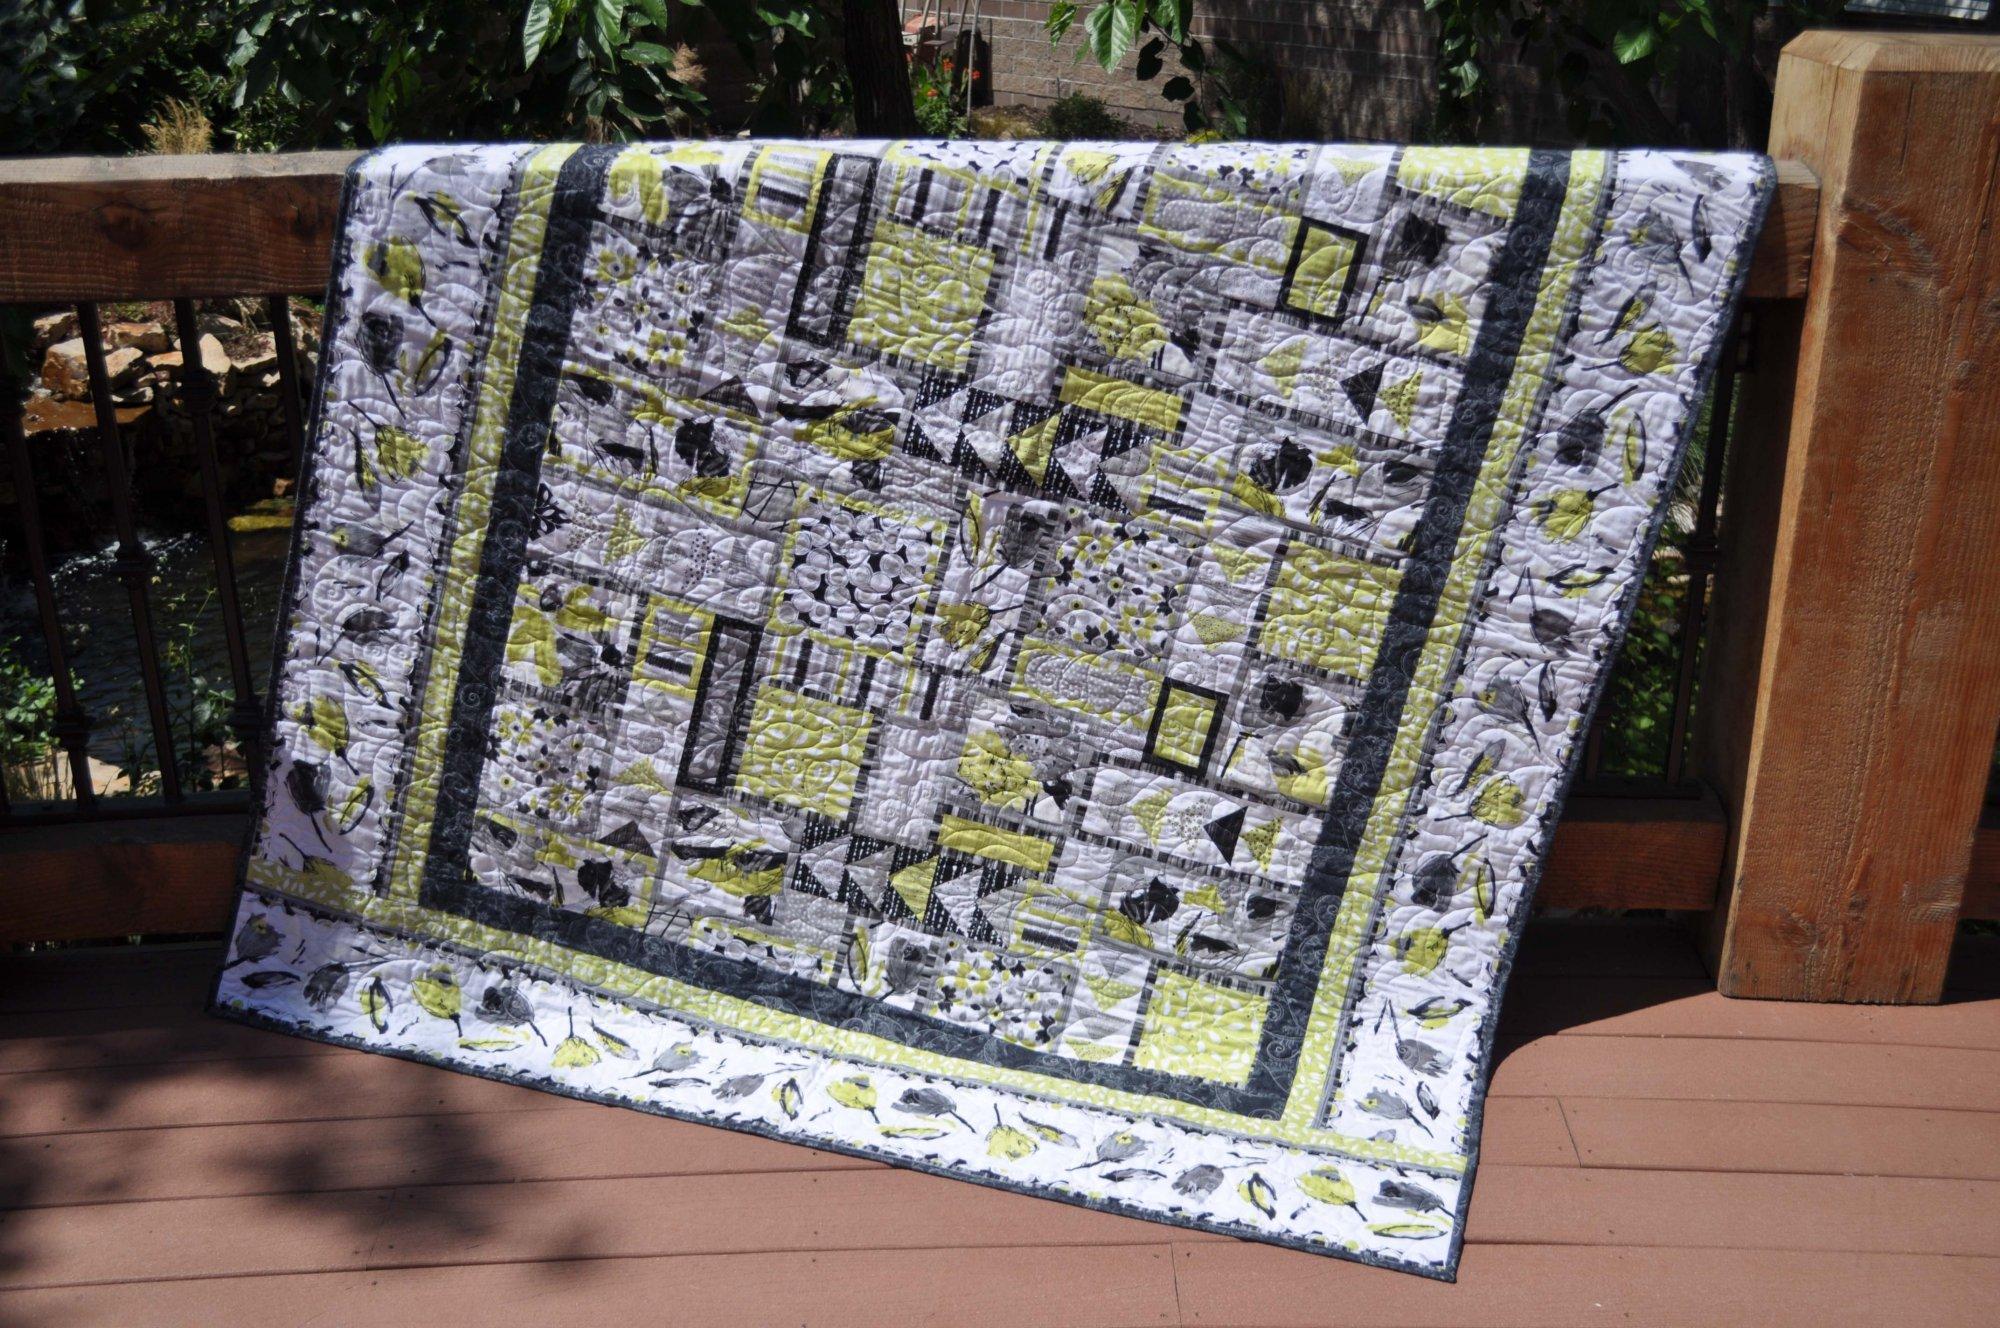 Green & Grey Quilt - 64 x 78